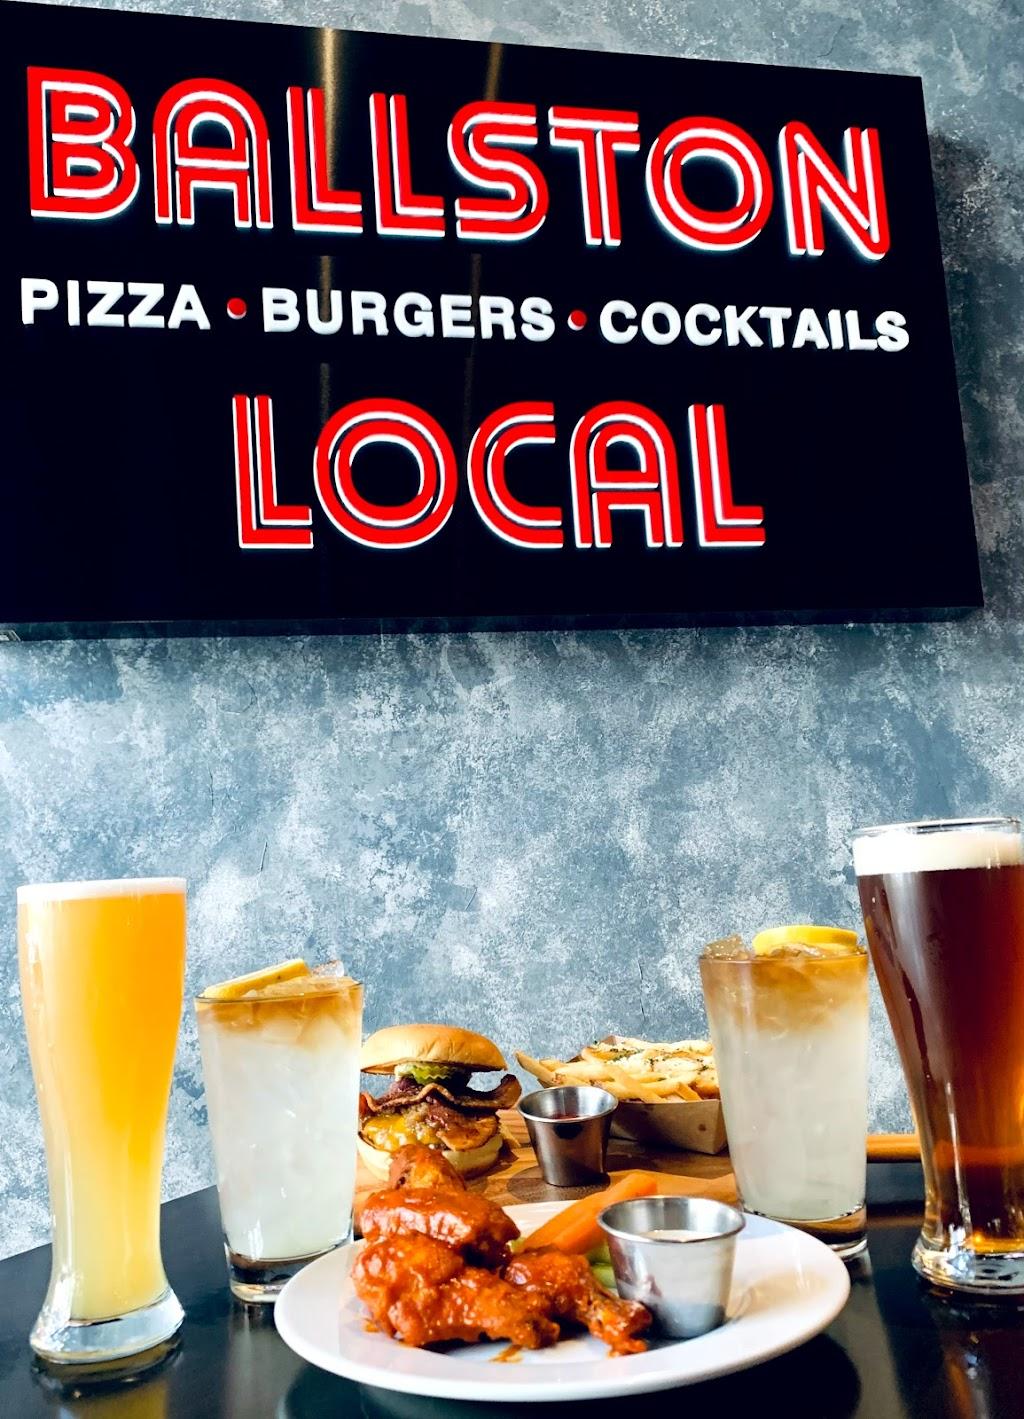 Ballston Local | restaurant | 900 N Glebe Rd, Arlington, VA 22203, USA | 7038521260 OR +1 703-852-1260